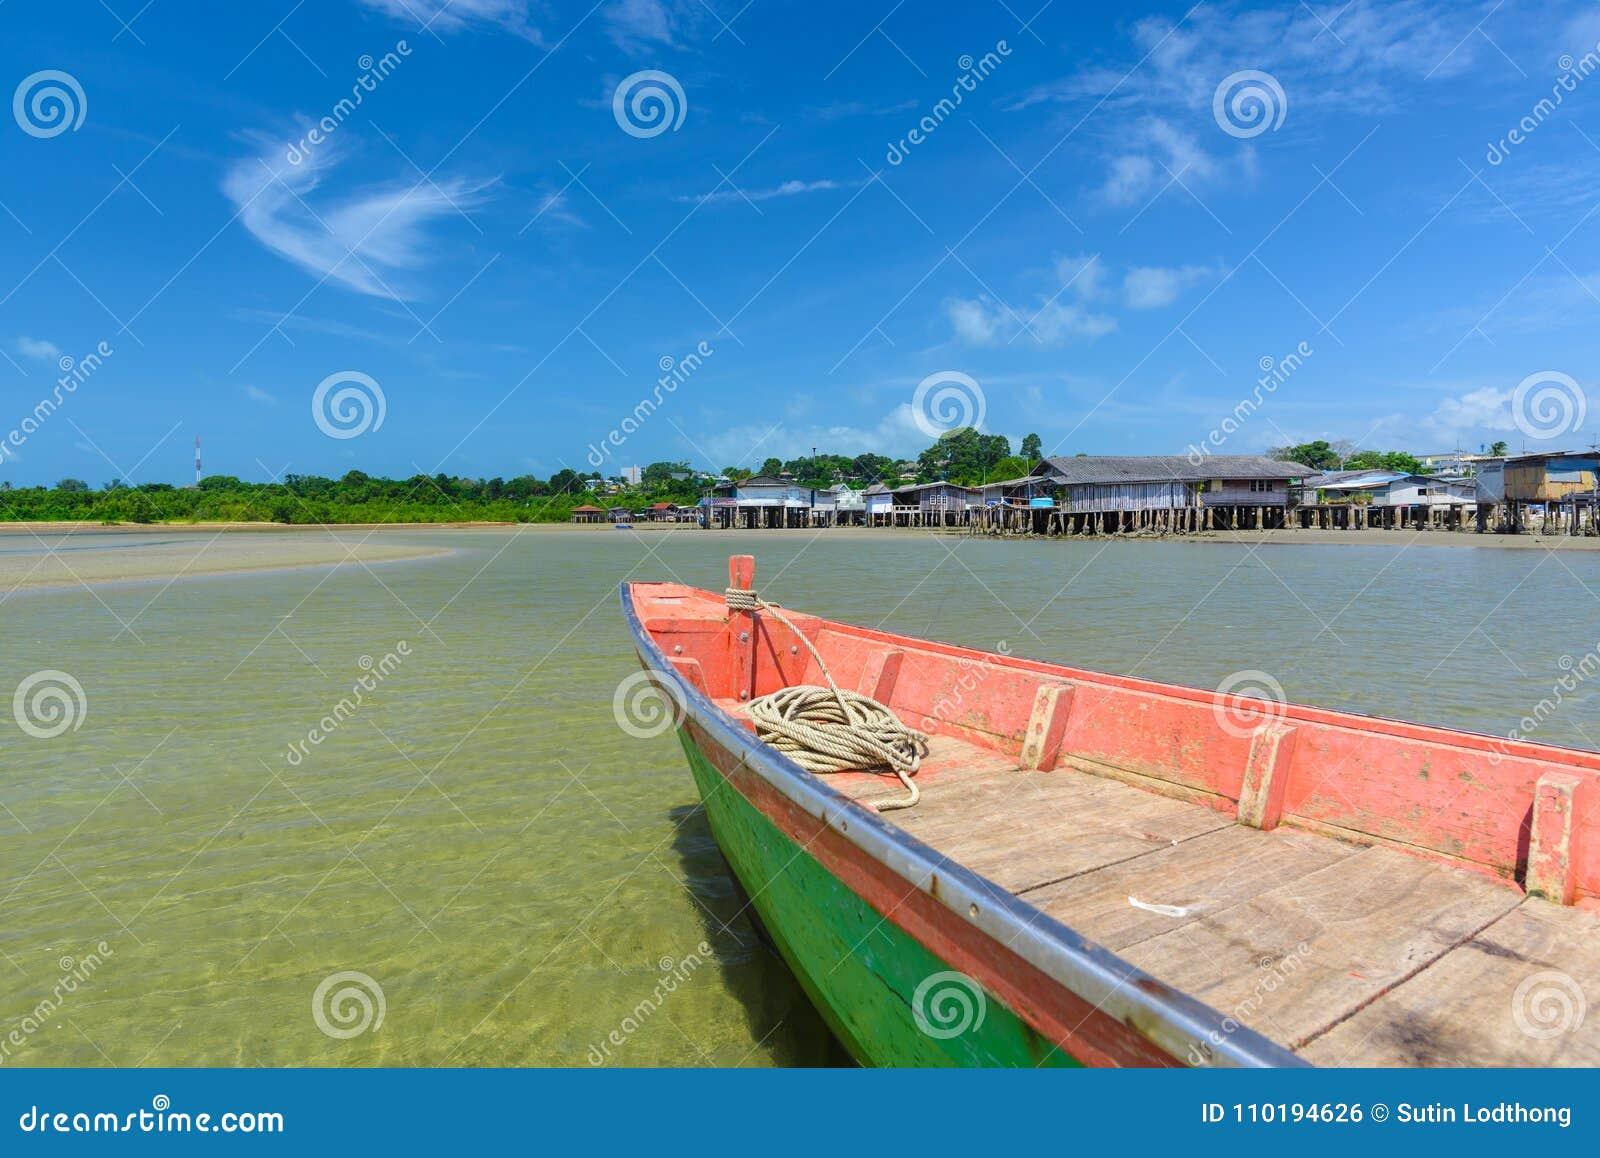 Barco de pesca estacionado no beira-mar